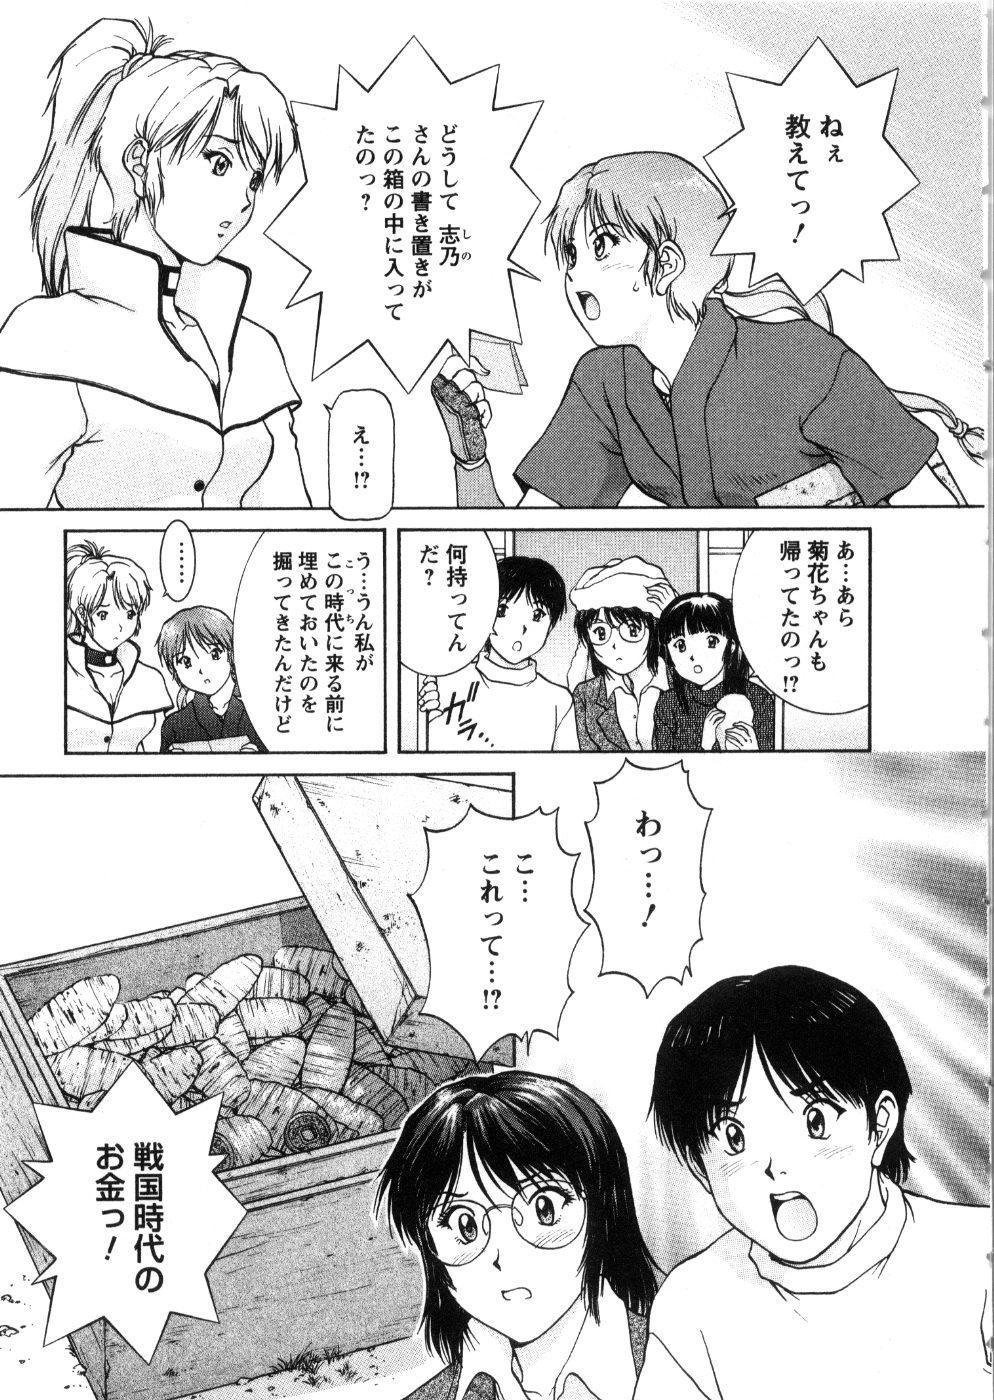 Oneechan-tachi ga Yatte Kuru 03 10